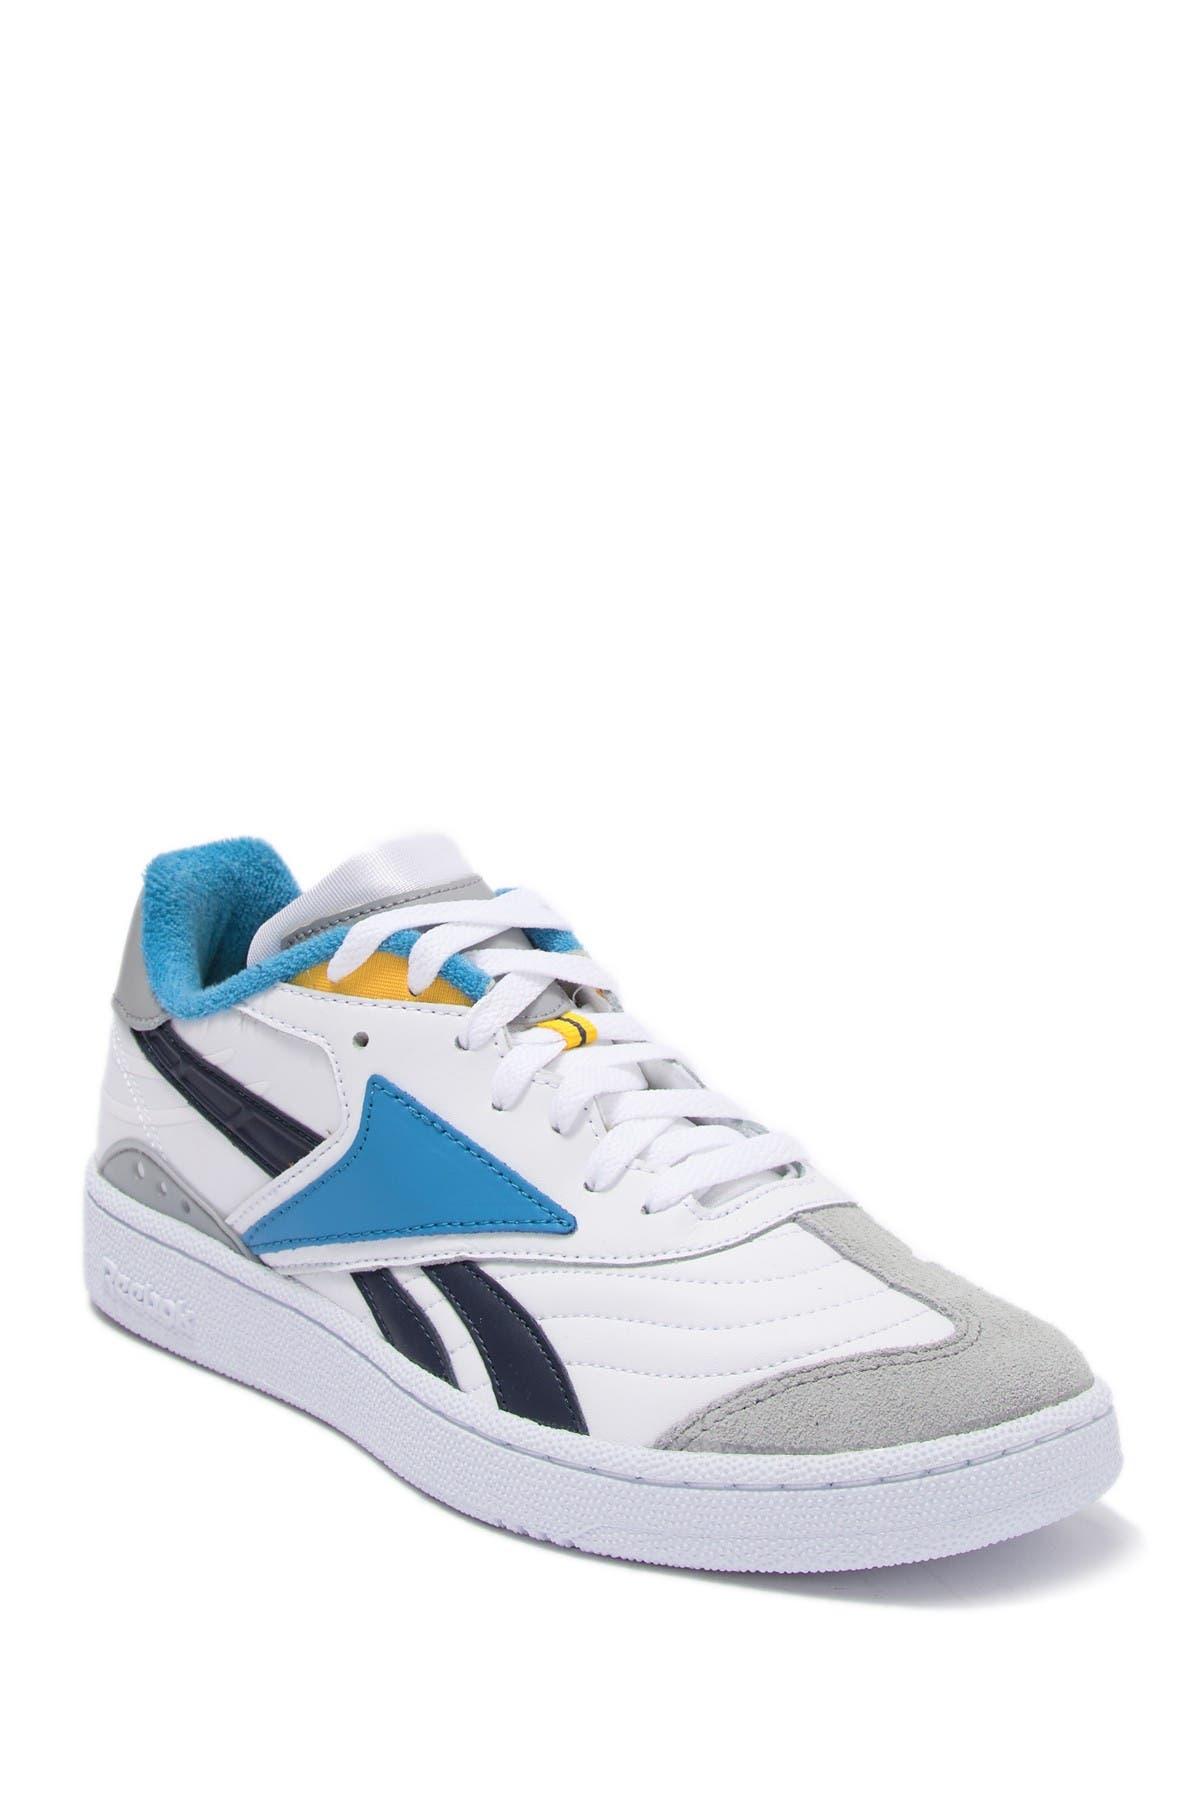 Image of Reebok Club C RC 1.0 Leather Sneaker